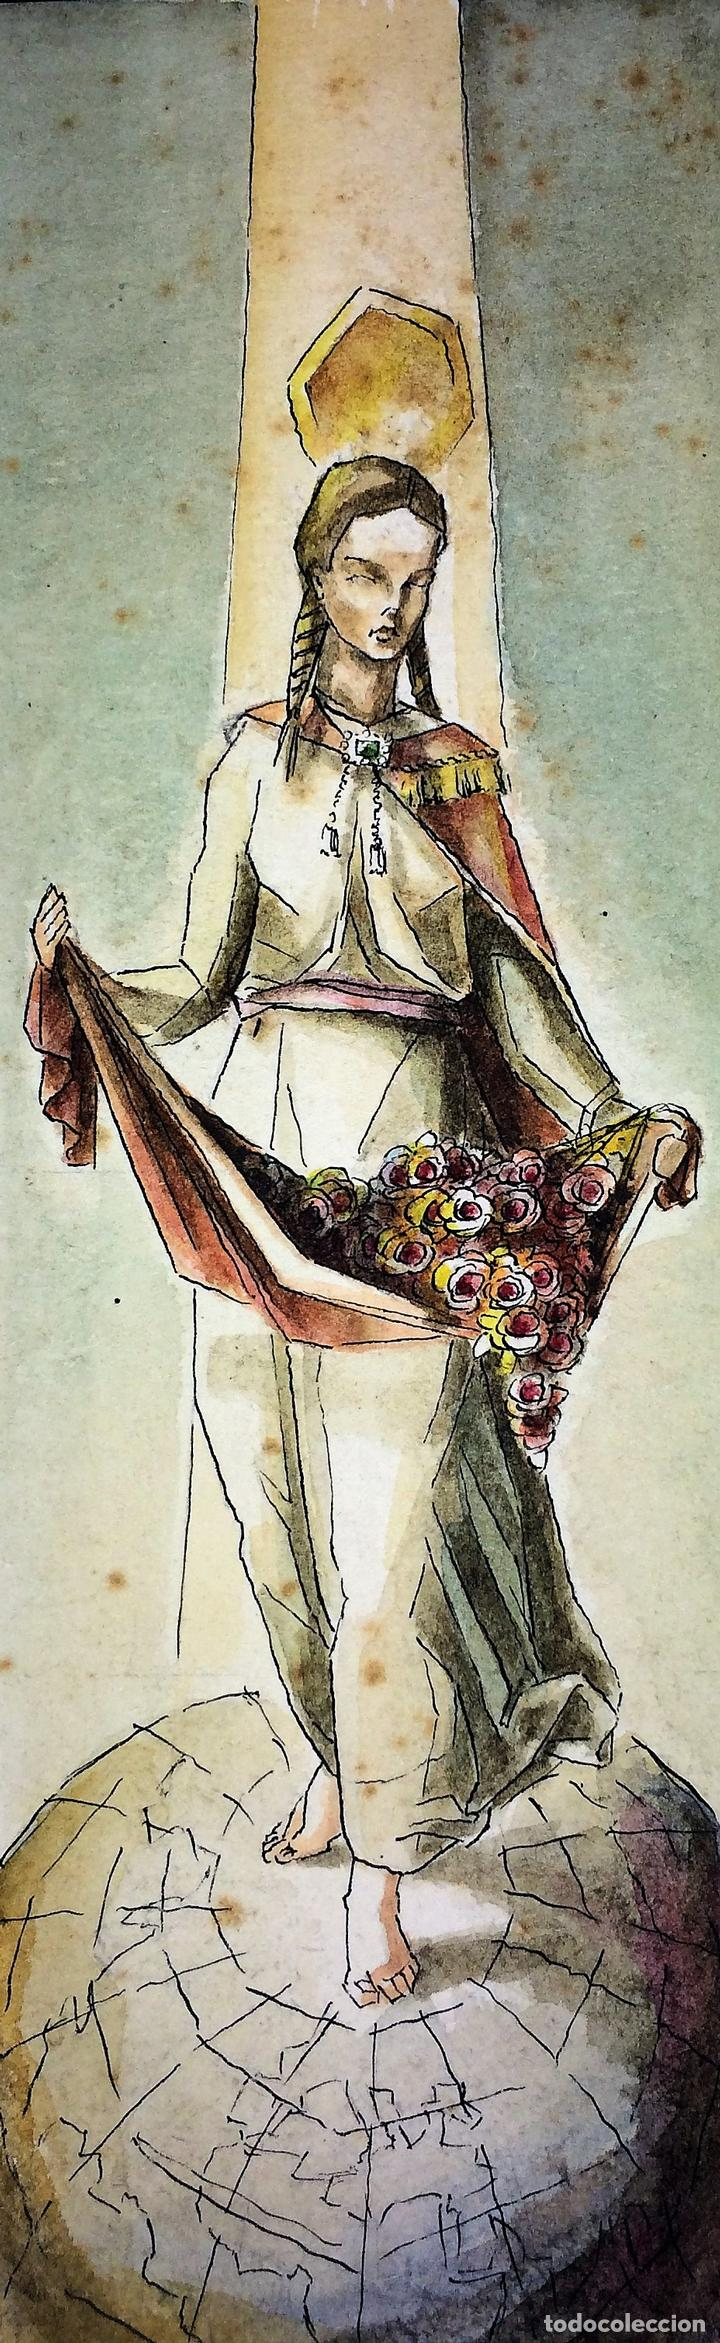 SANTA ISABEL REINA. ACUARELA SOBRE CARTULINA. FIRMADO GORGUES. ESPAÑA. CIRCA 1960 (Arte - Arte Religioso - Pintura Religiosa - Acuarela)